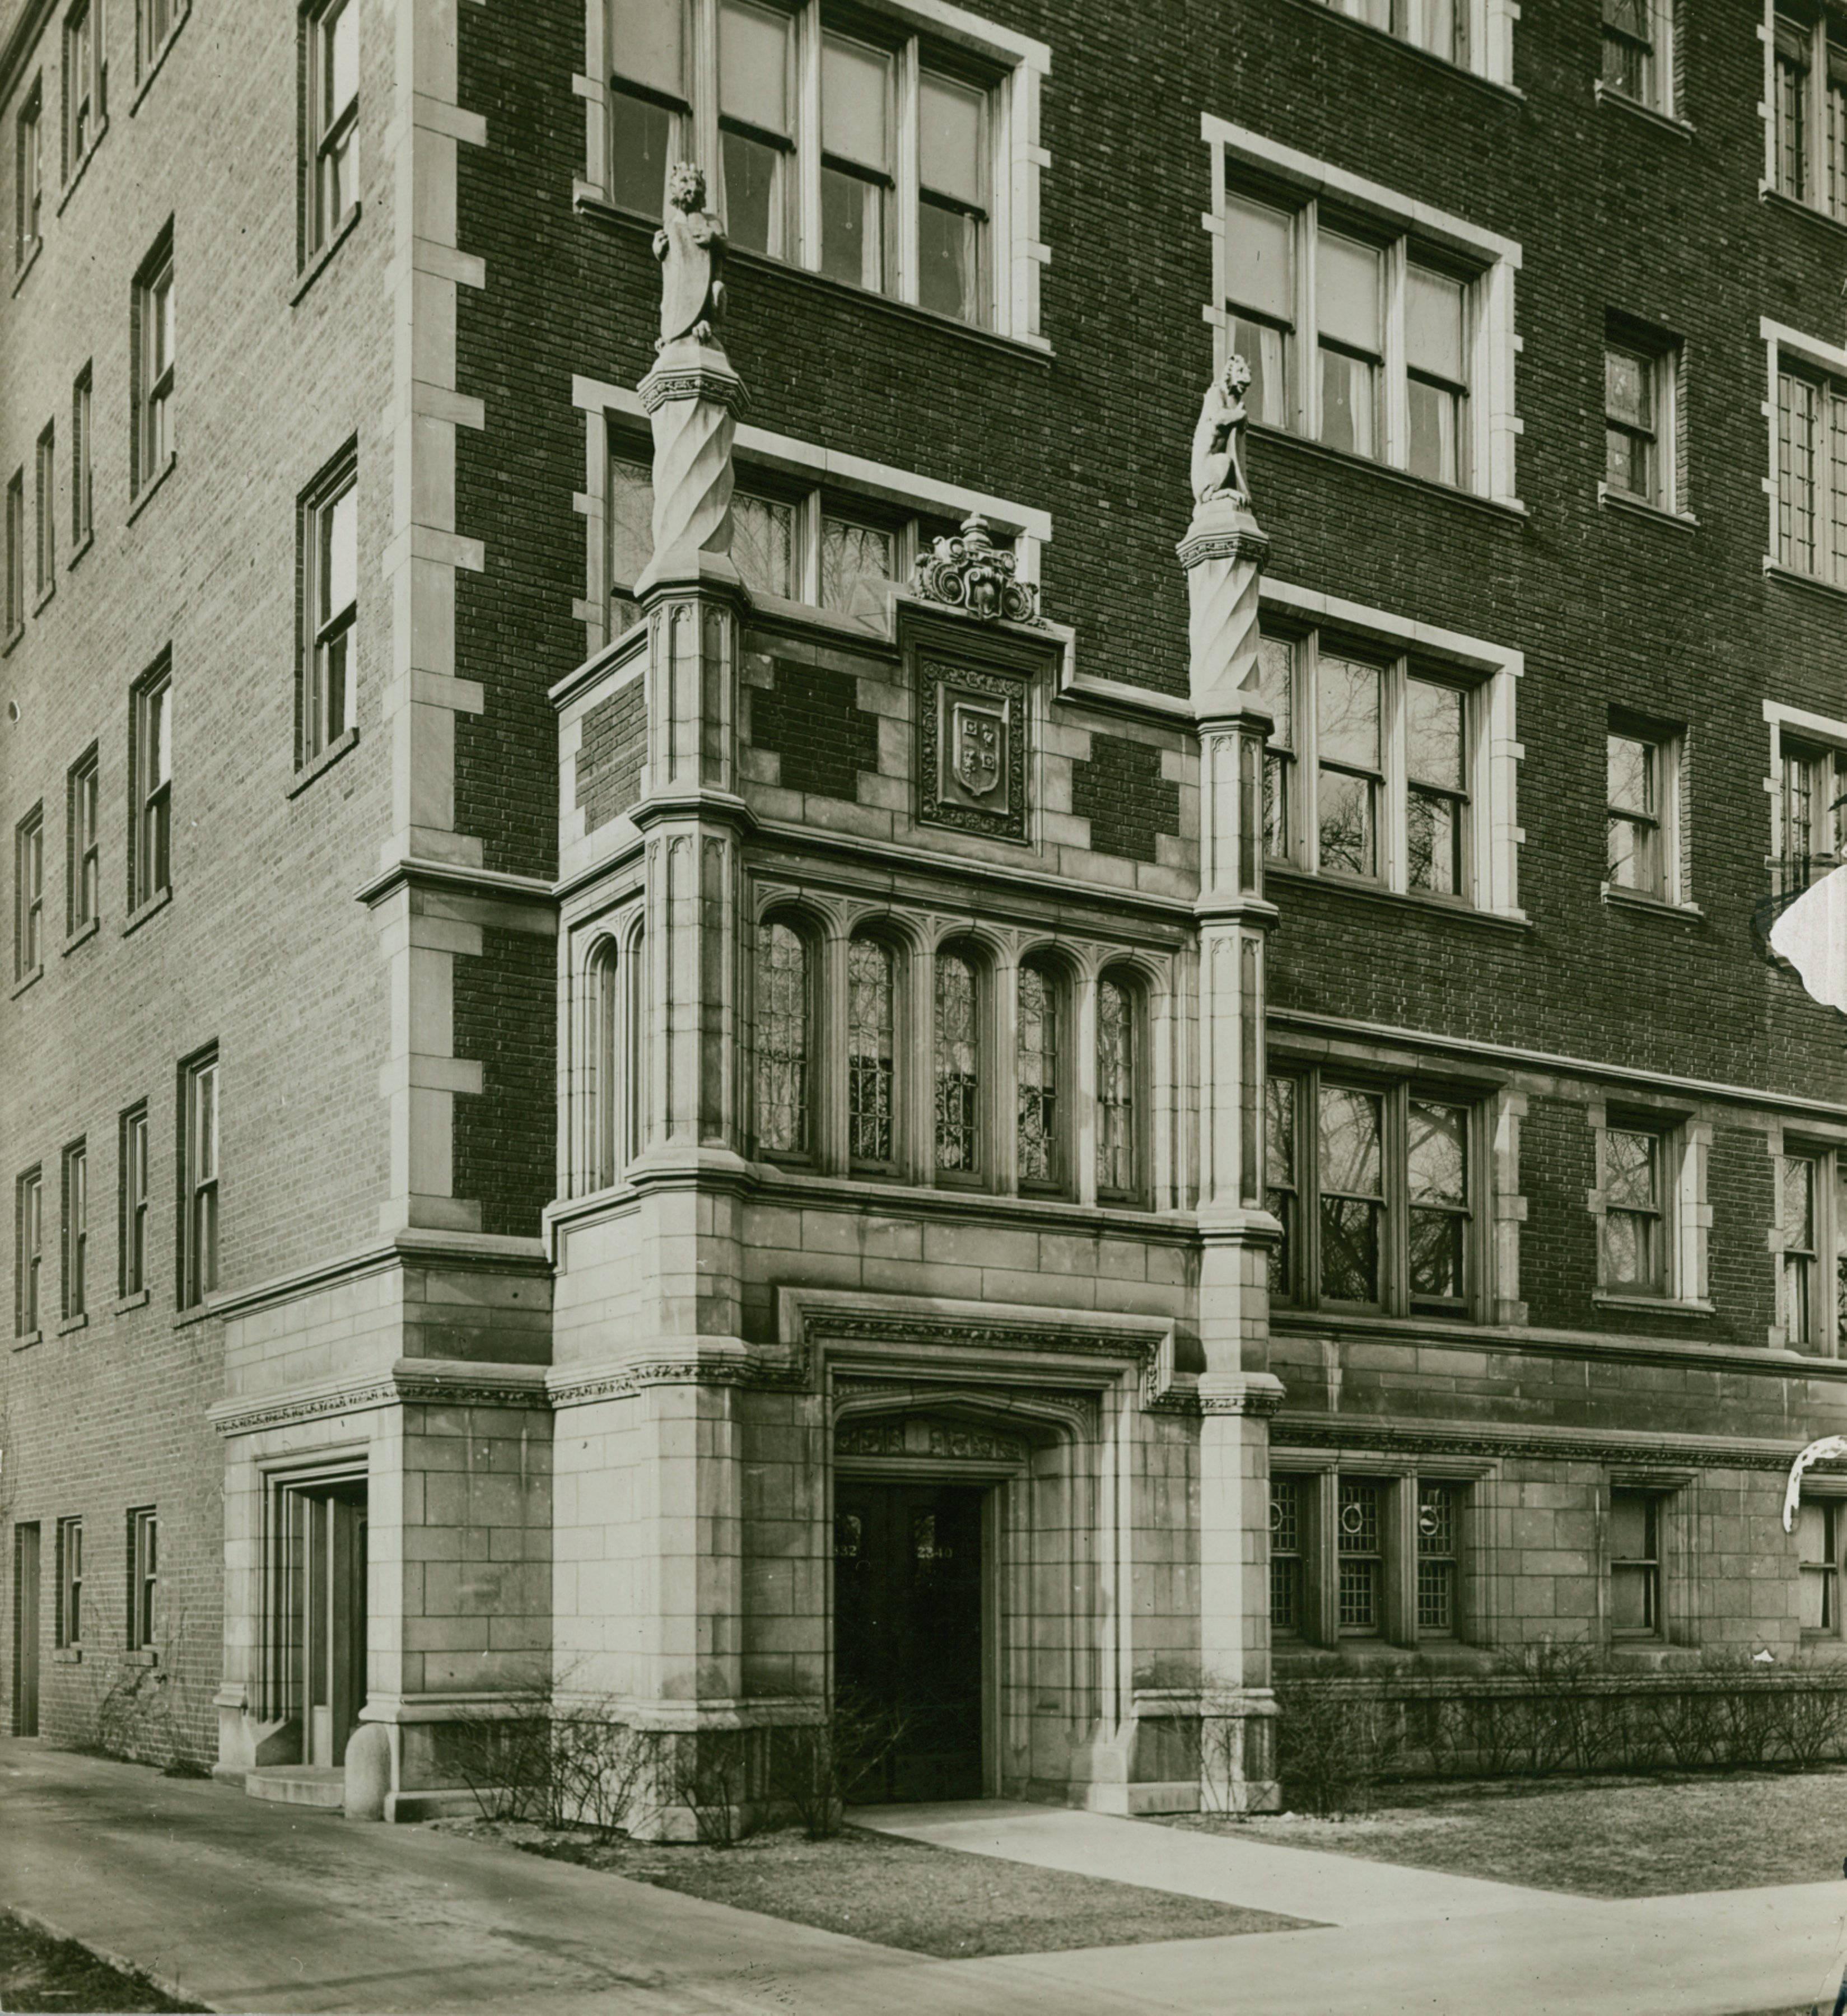 Lincoln Park Apartments For Rent: File:Apartment Building, 2332-2340 Lincoln Park West